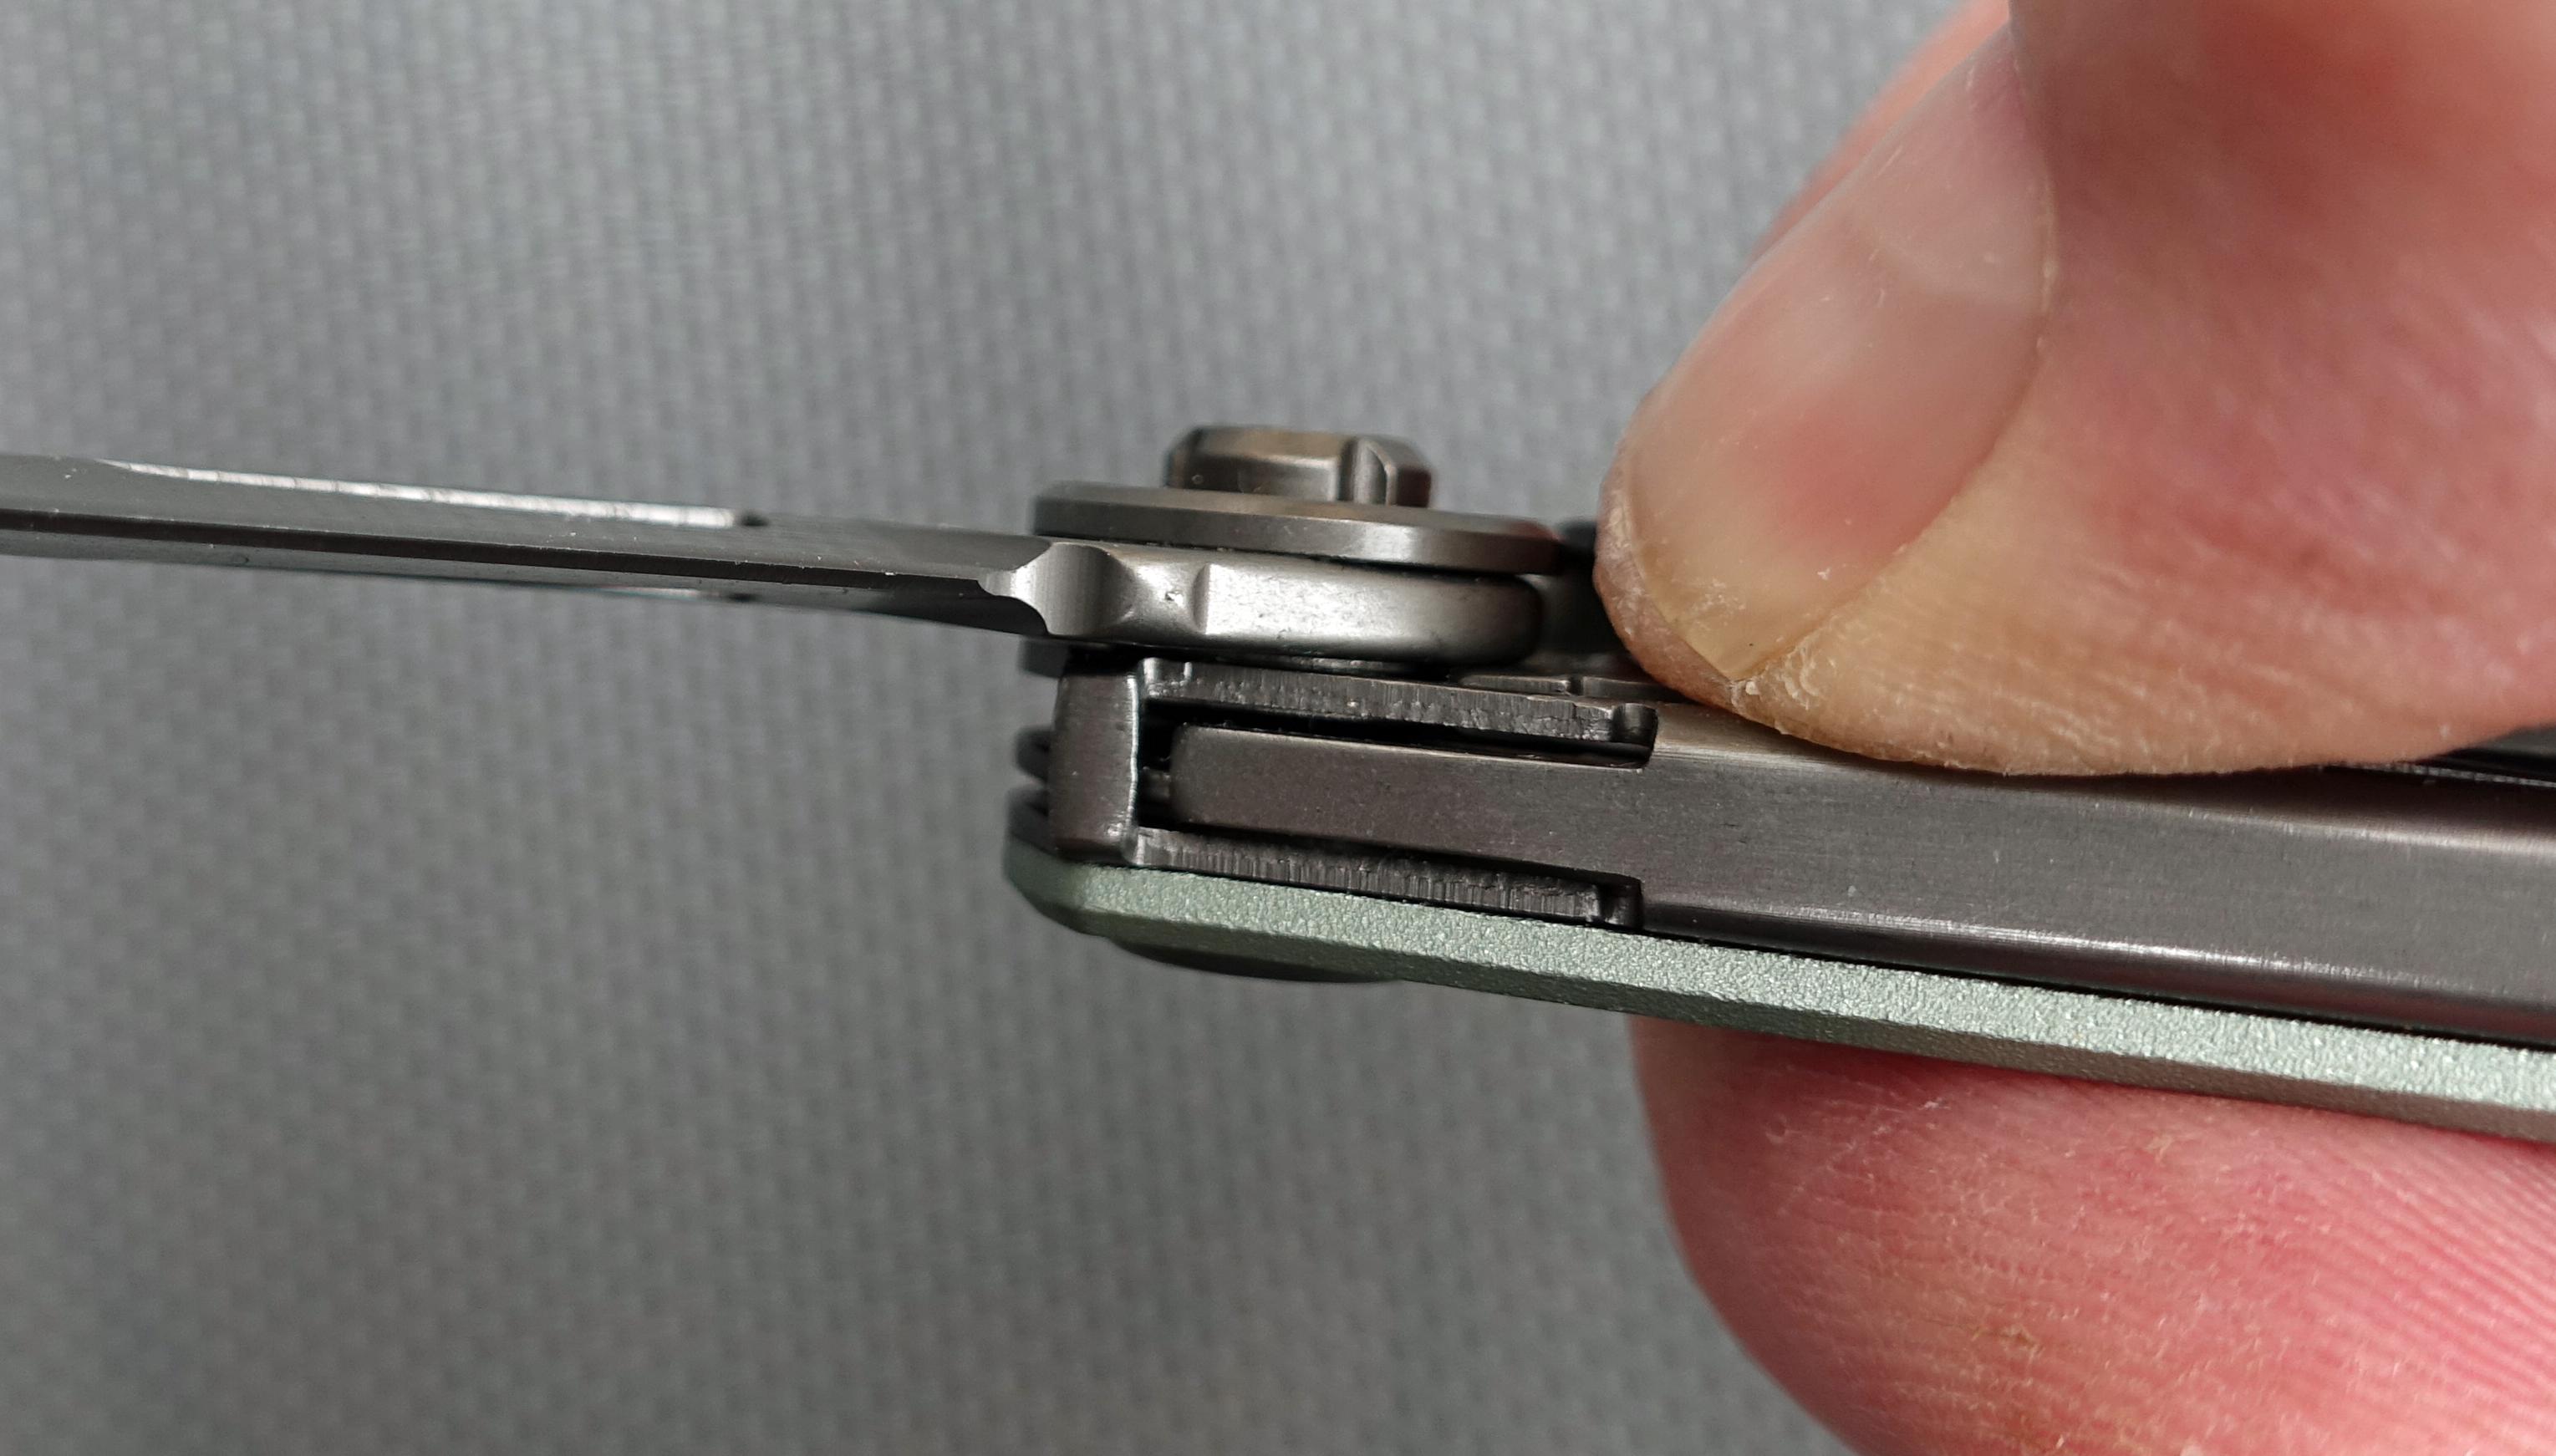 Effective frame lock